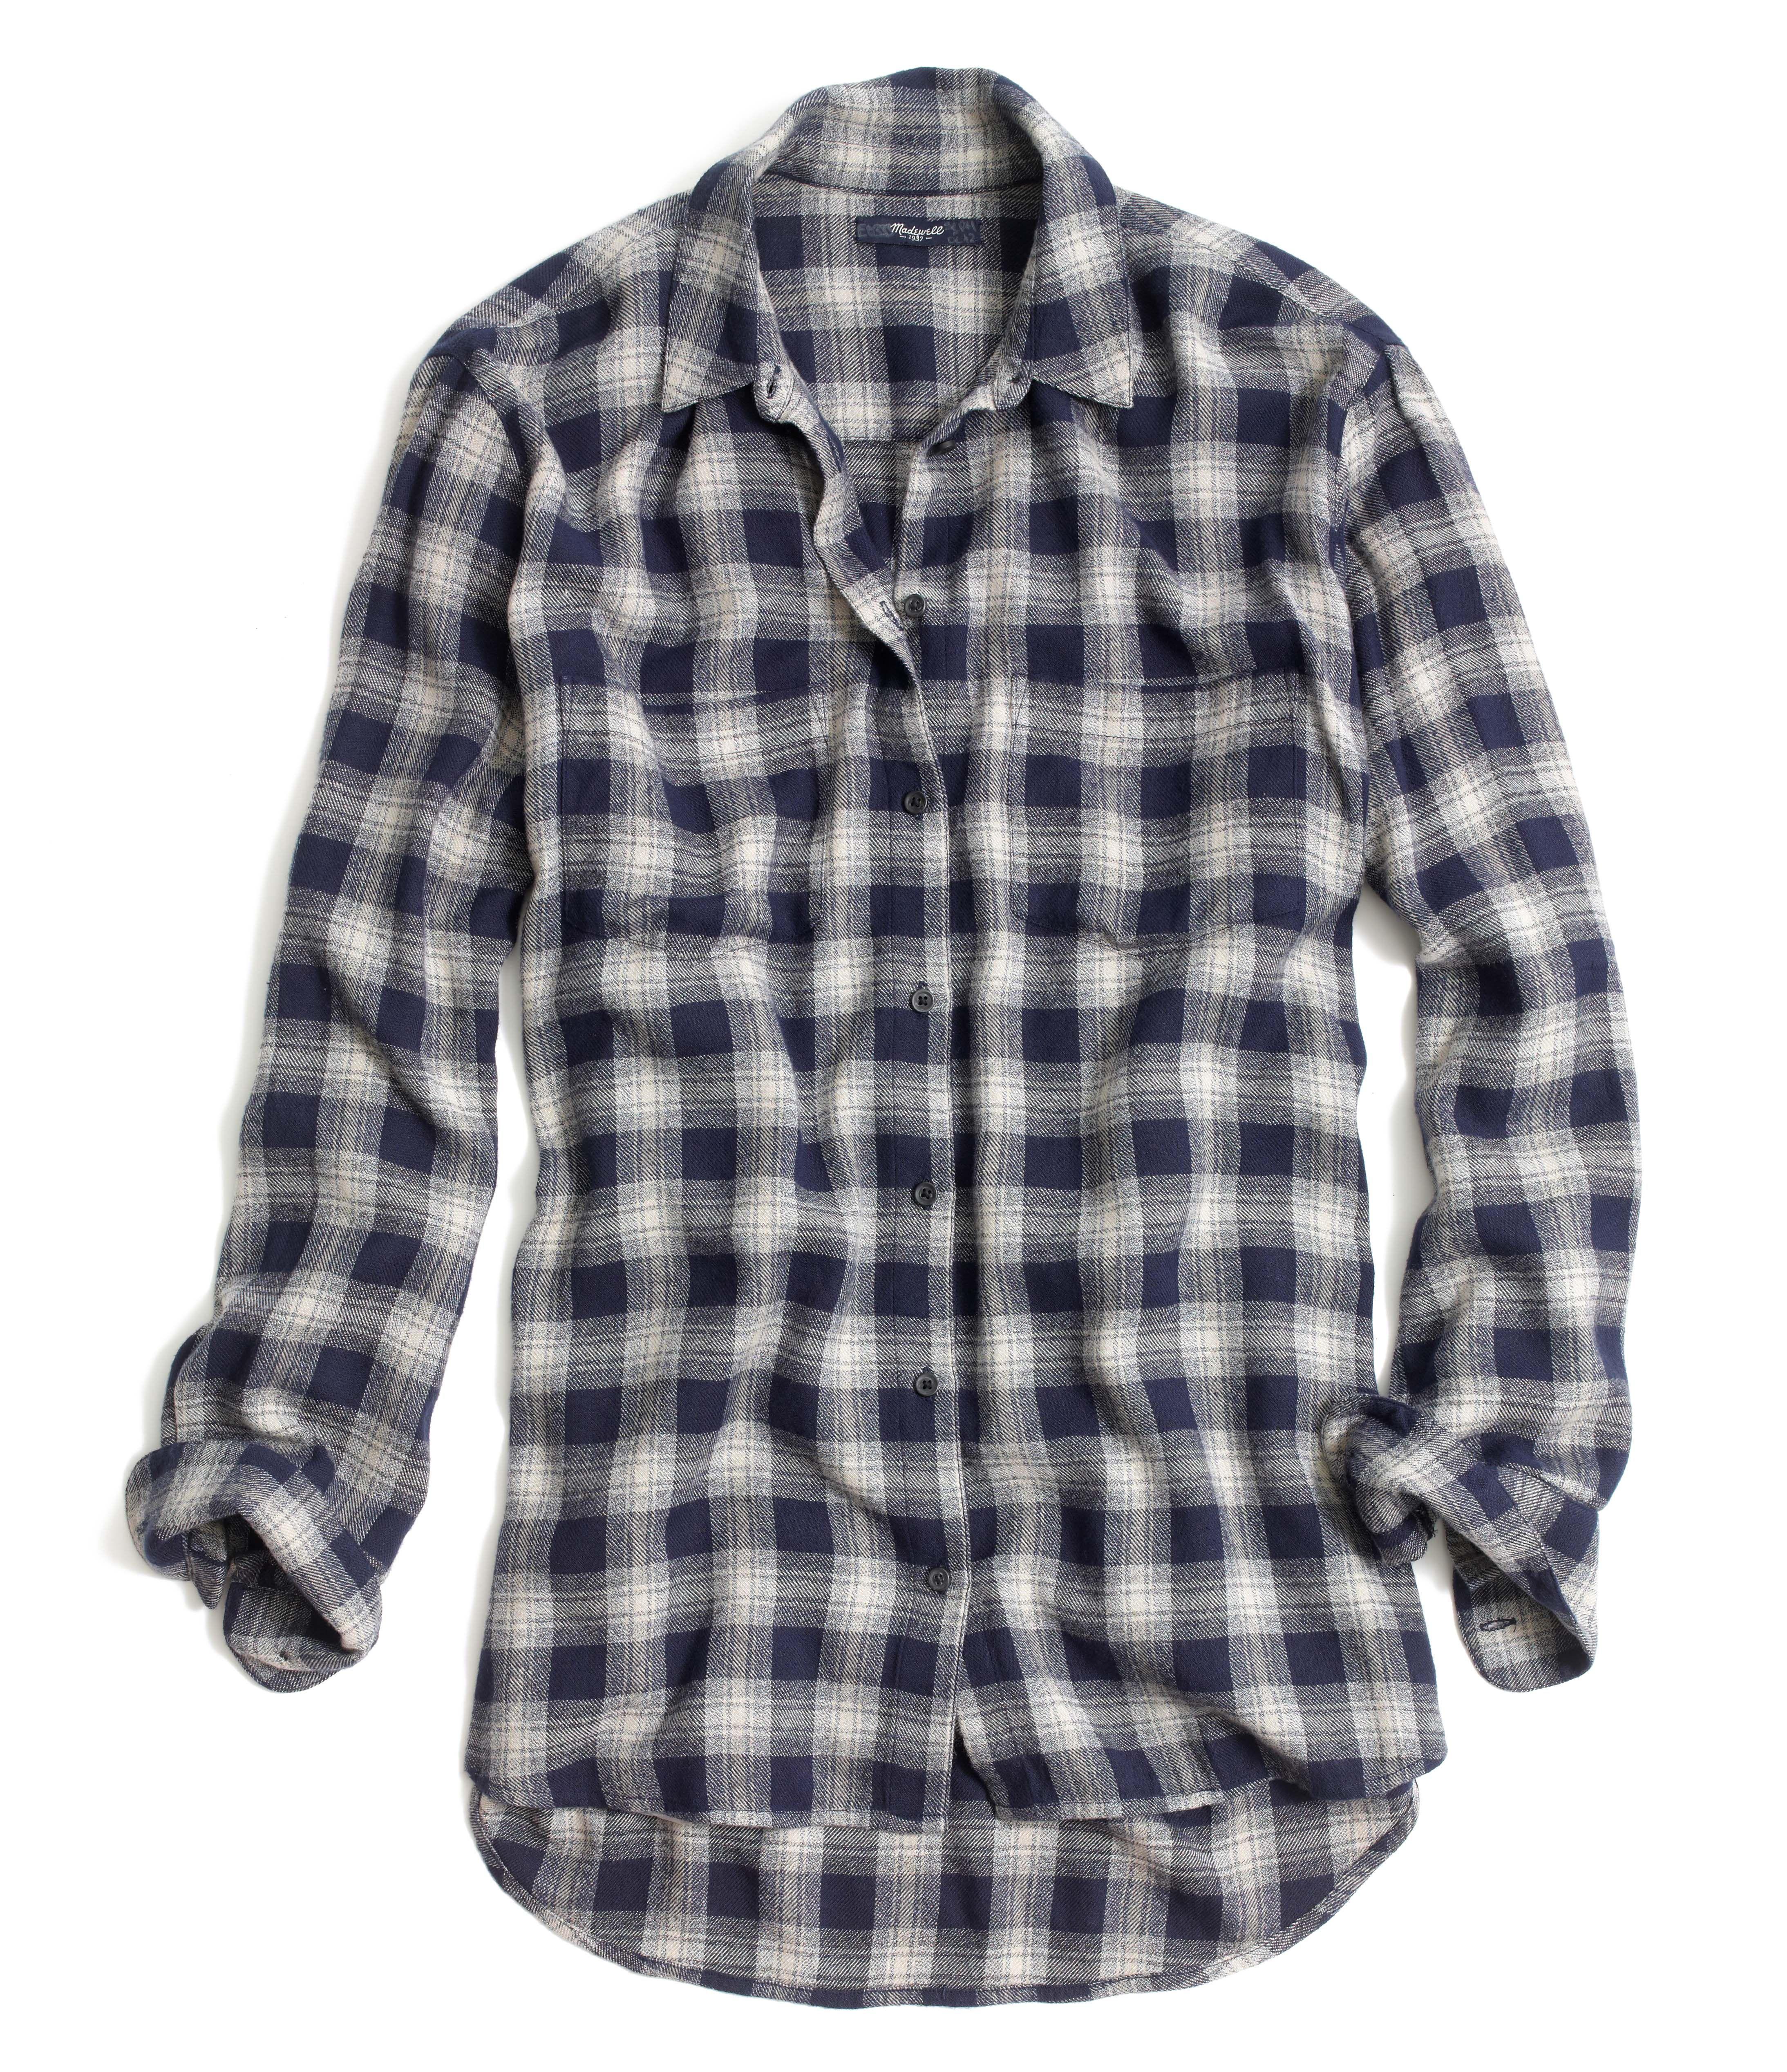 madewell oversized boyshirt in andover plaid. #everydaymadewell